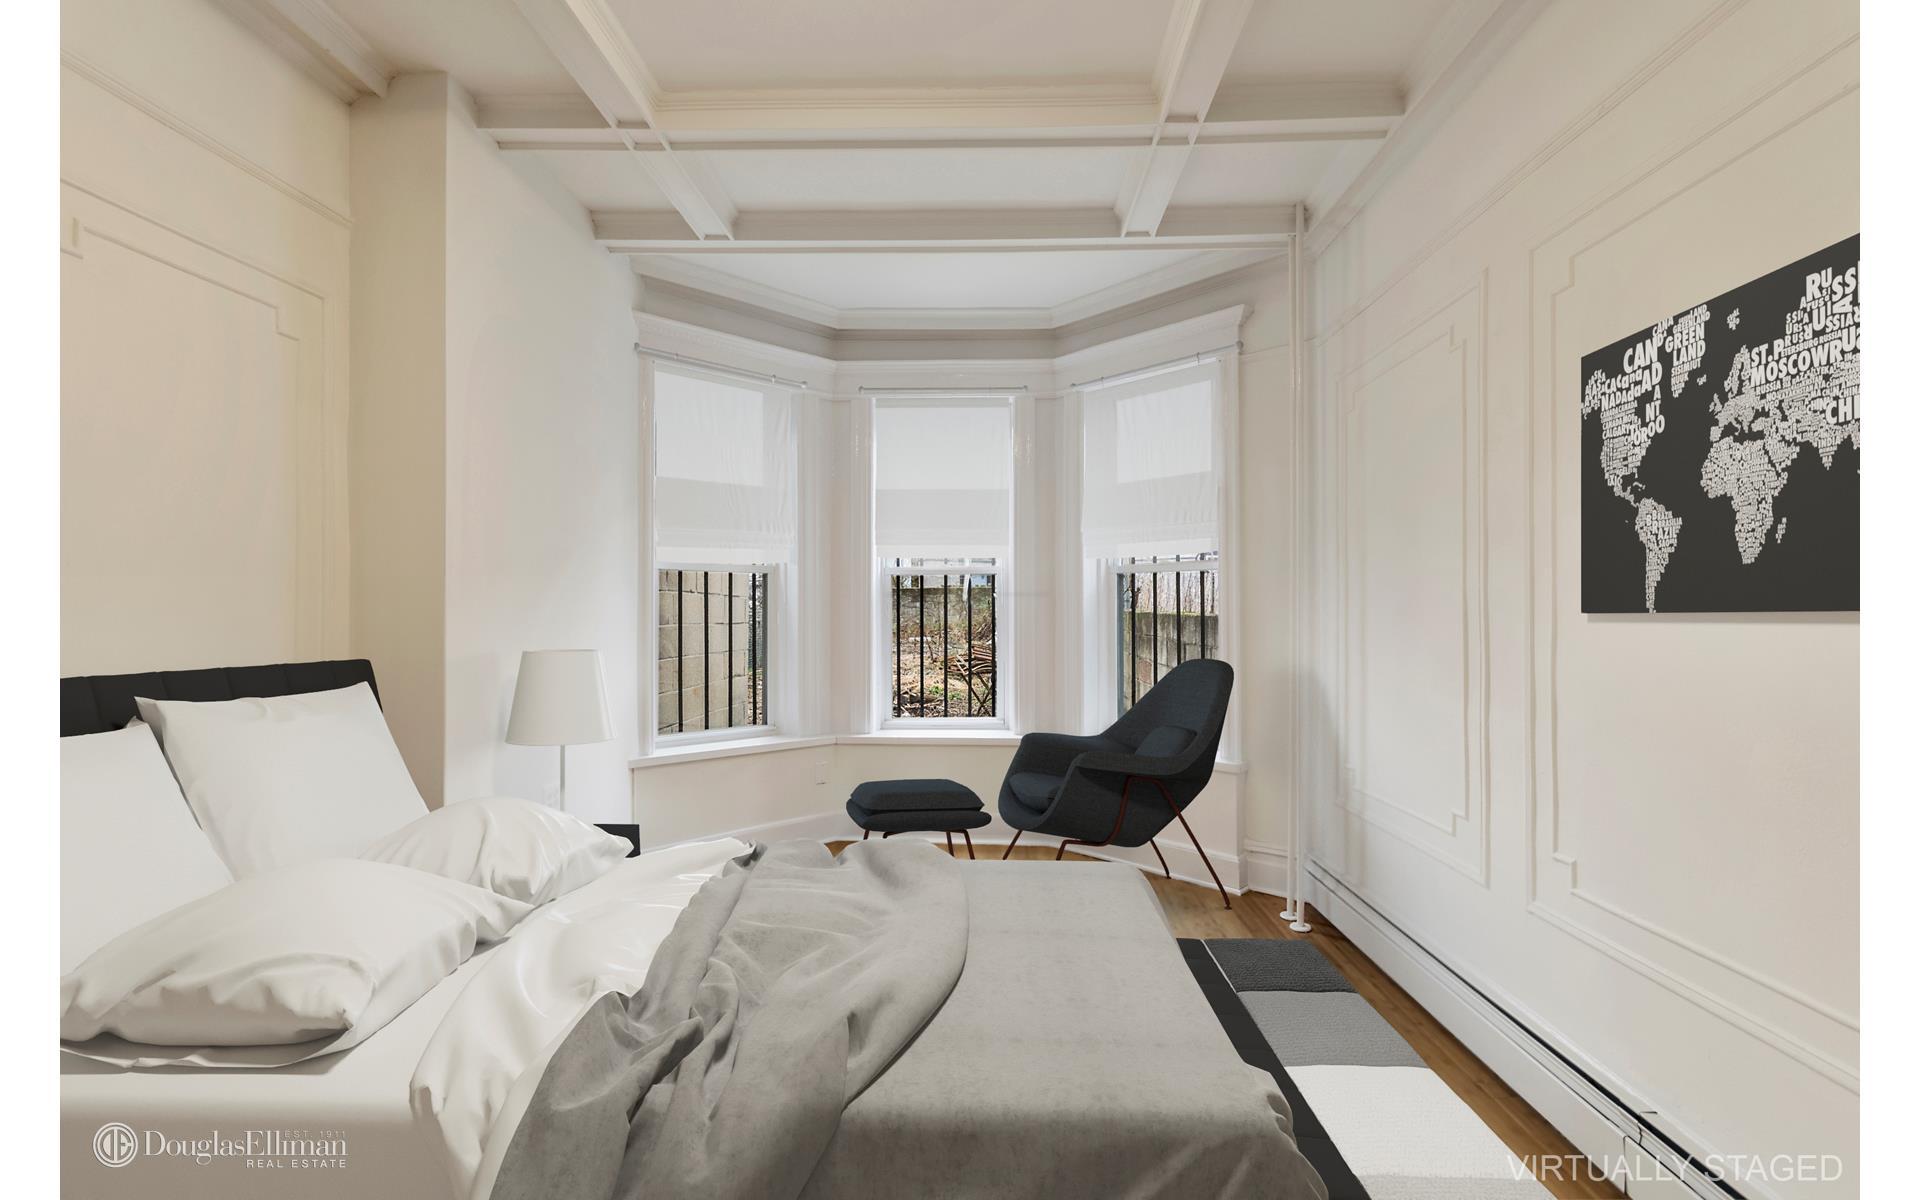 Crown Heights 2 Bedroom Rental At 1430 Sterling Pl Brooklyn NY 11213 1 2